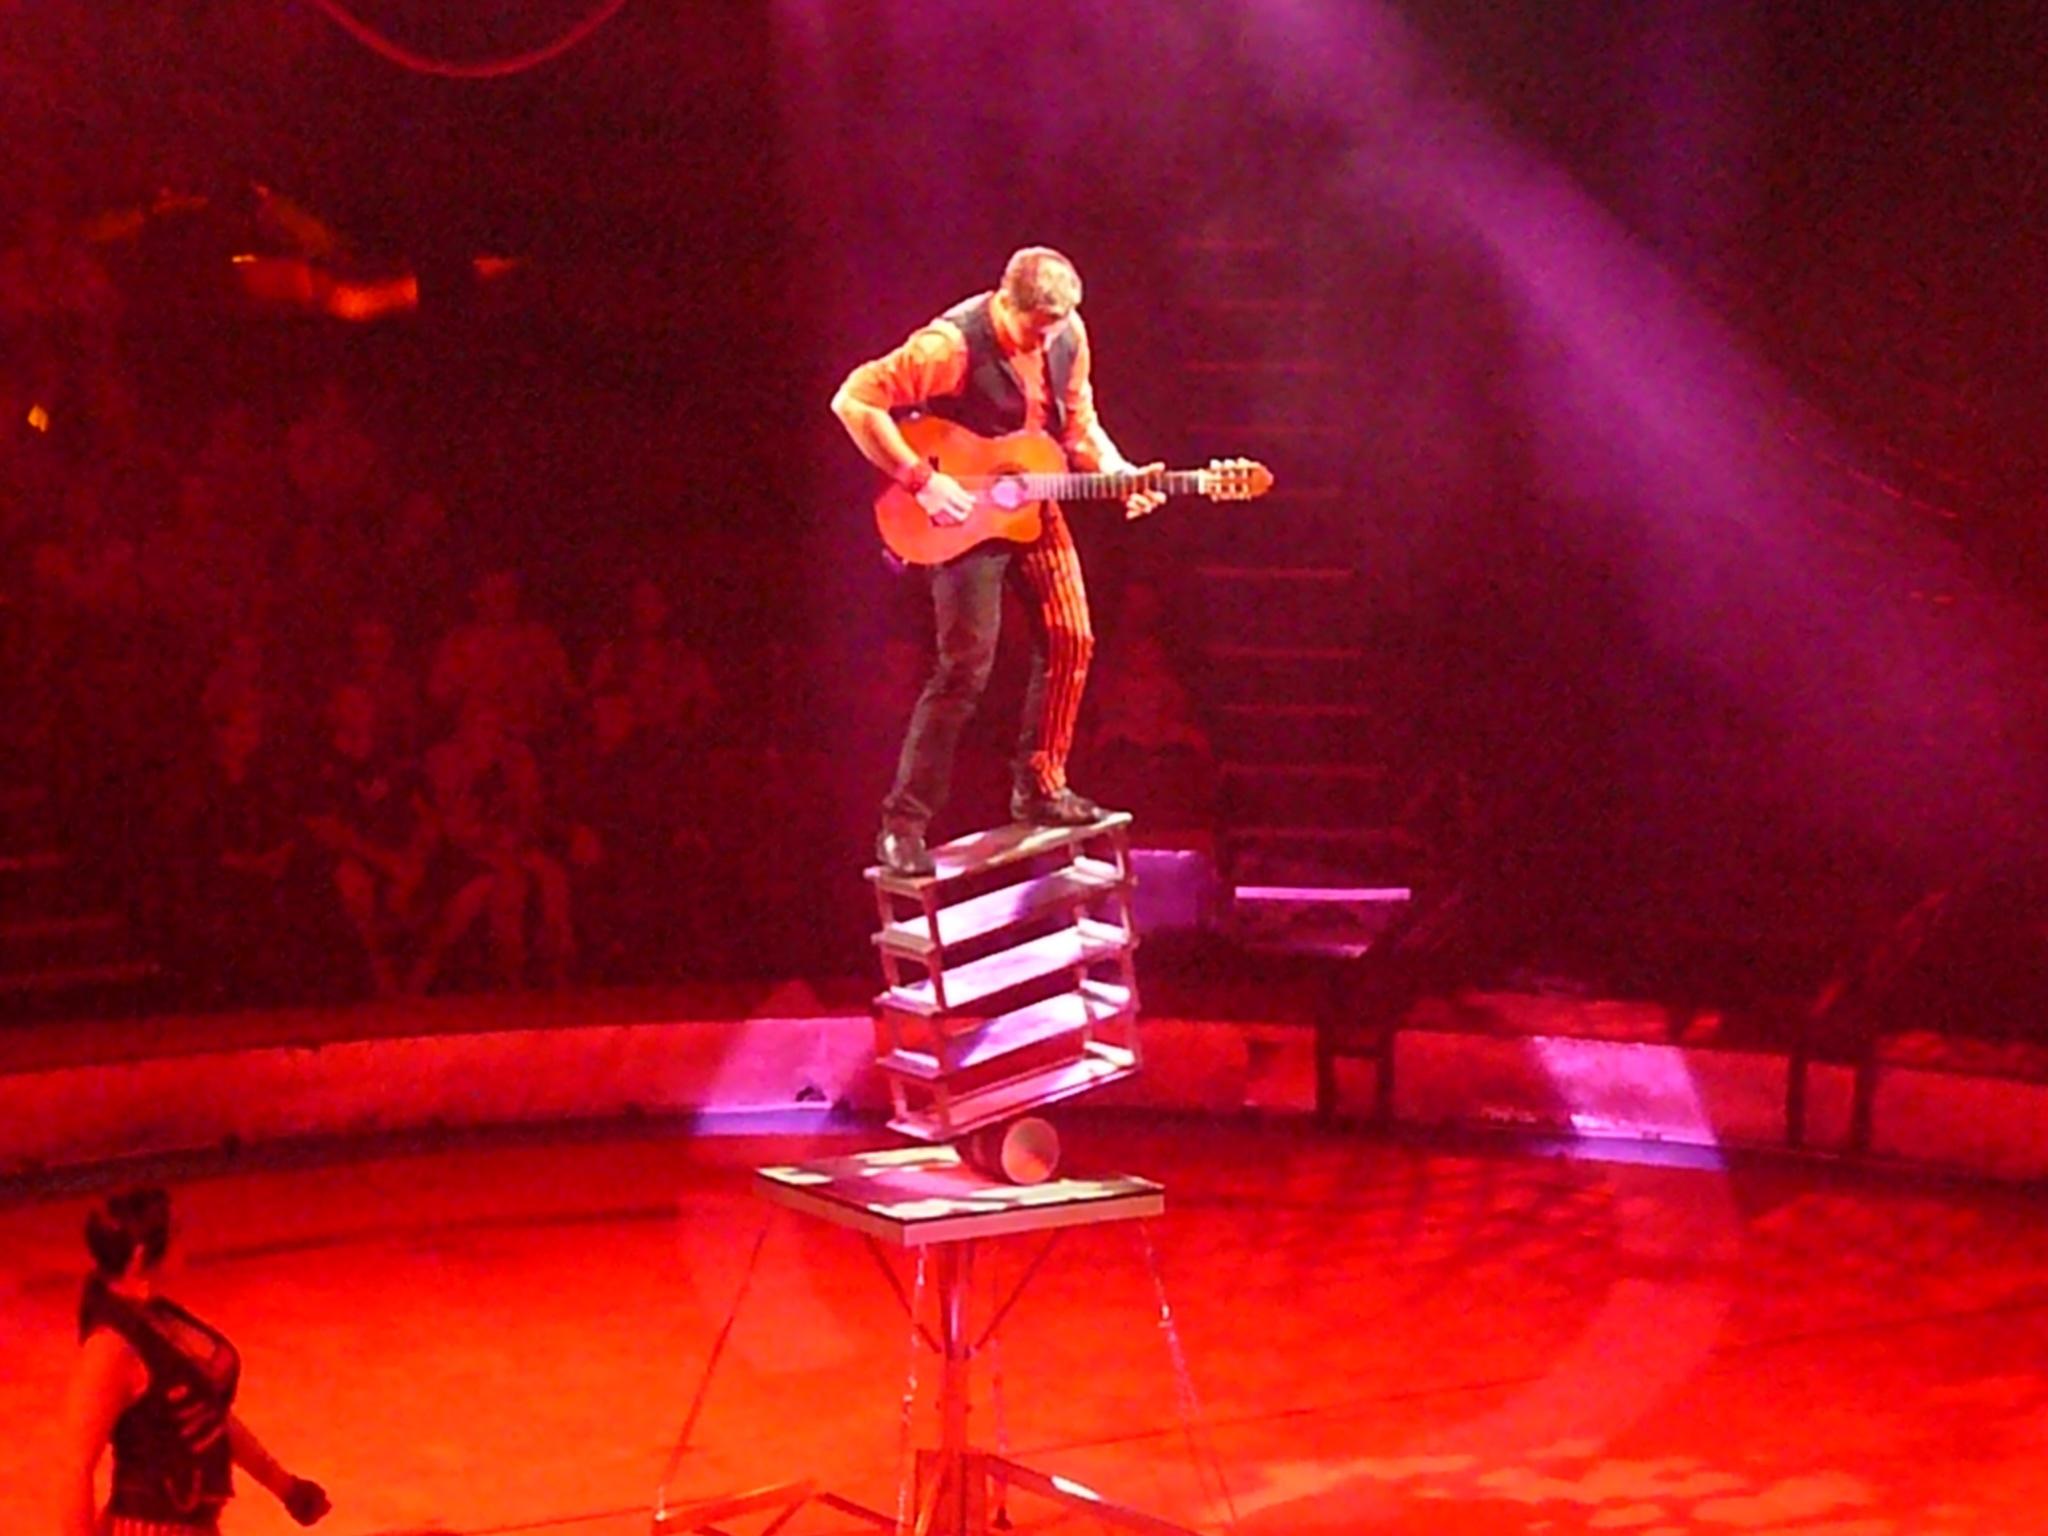 Rock and Roll by AJ Yakstrangler Andy Jamieson